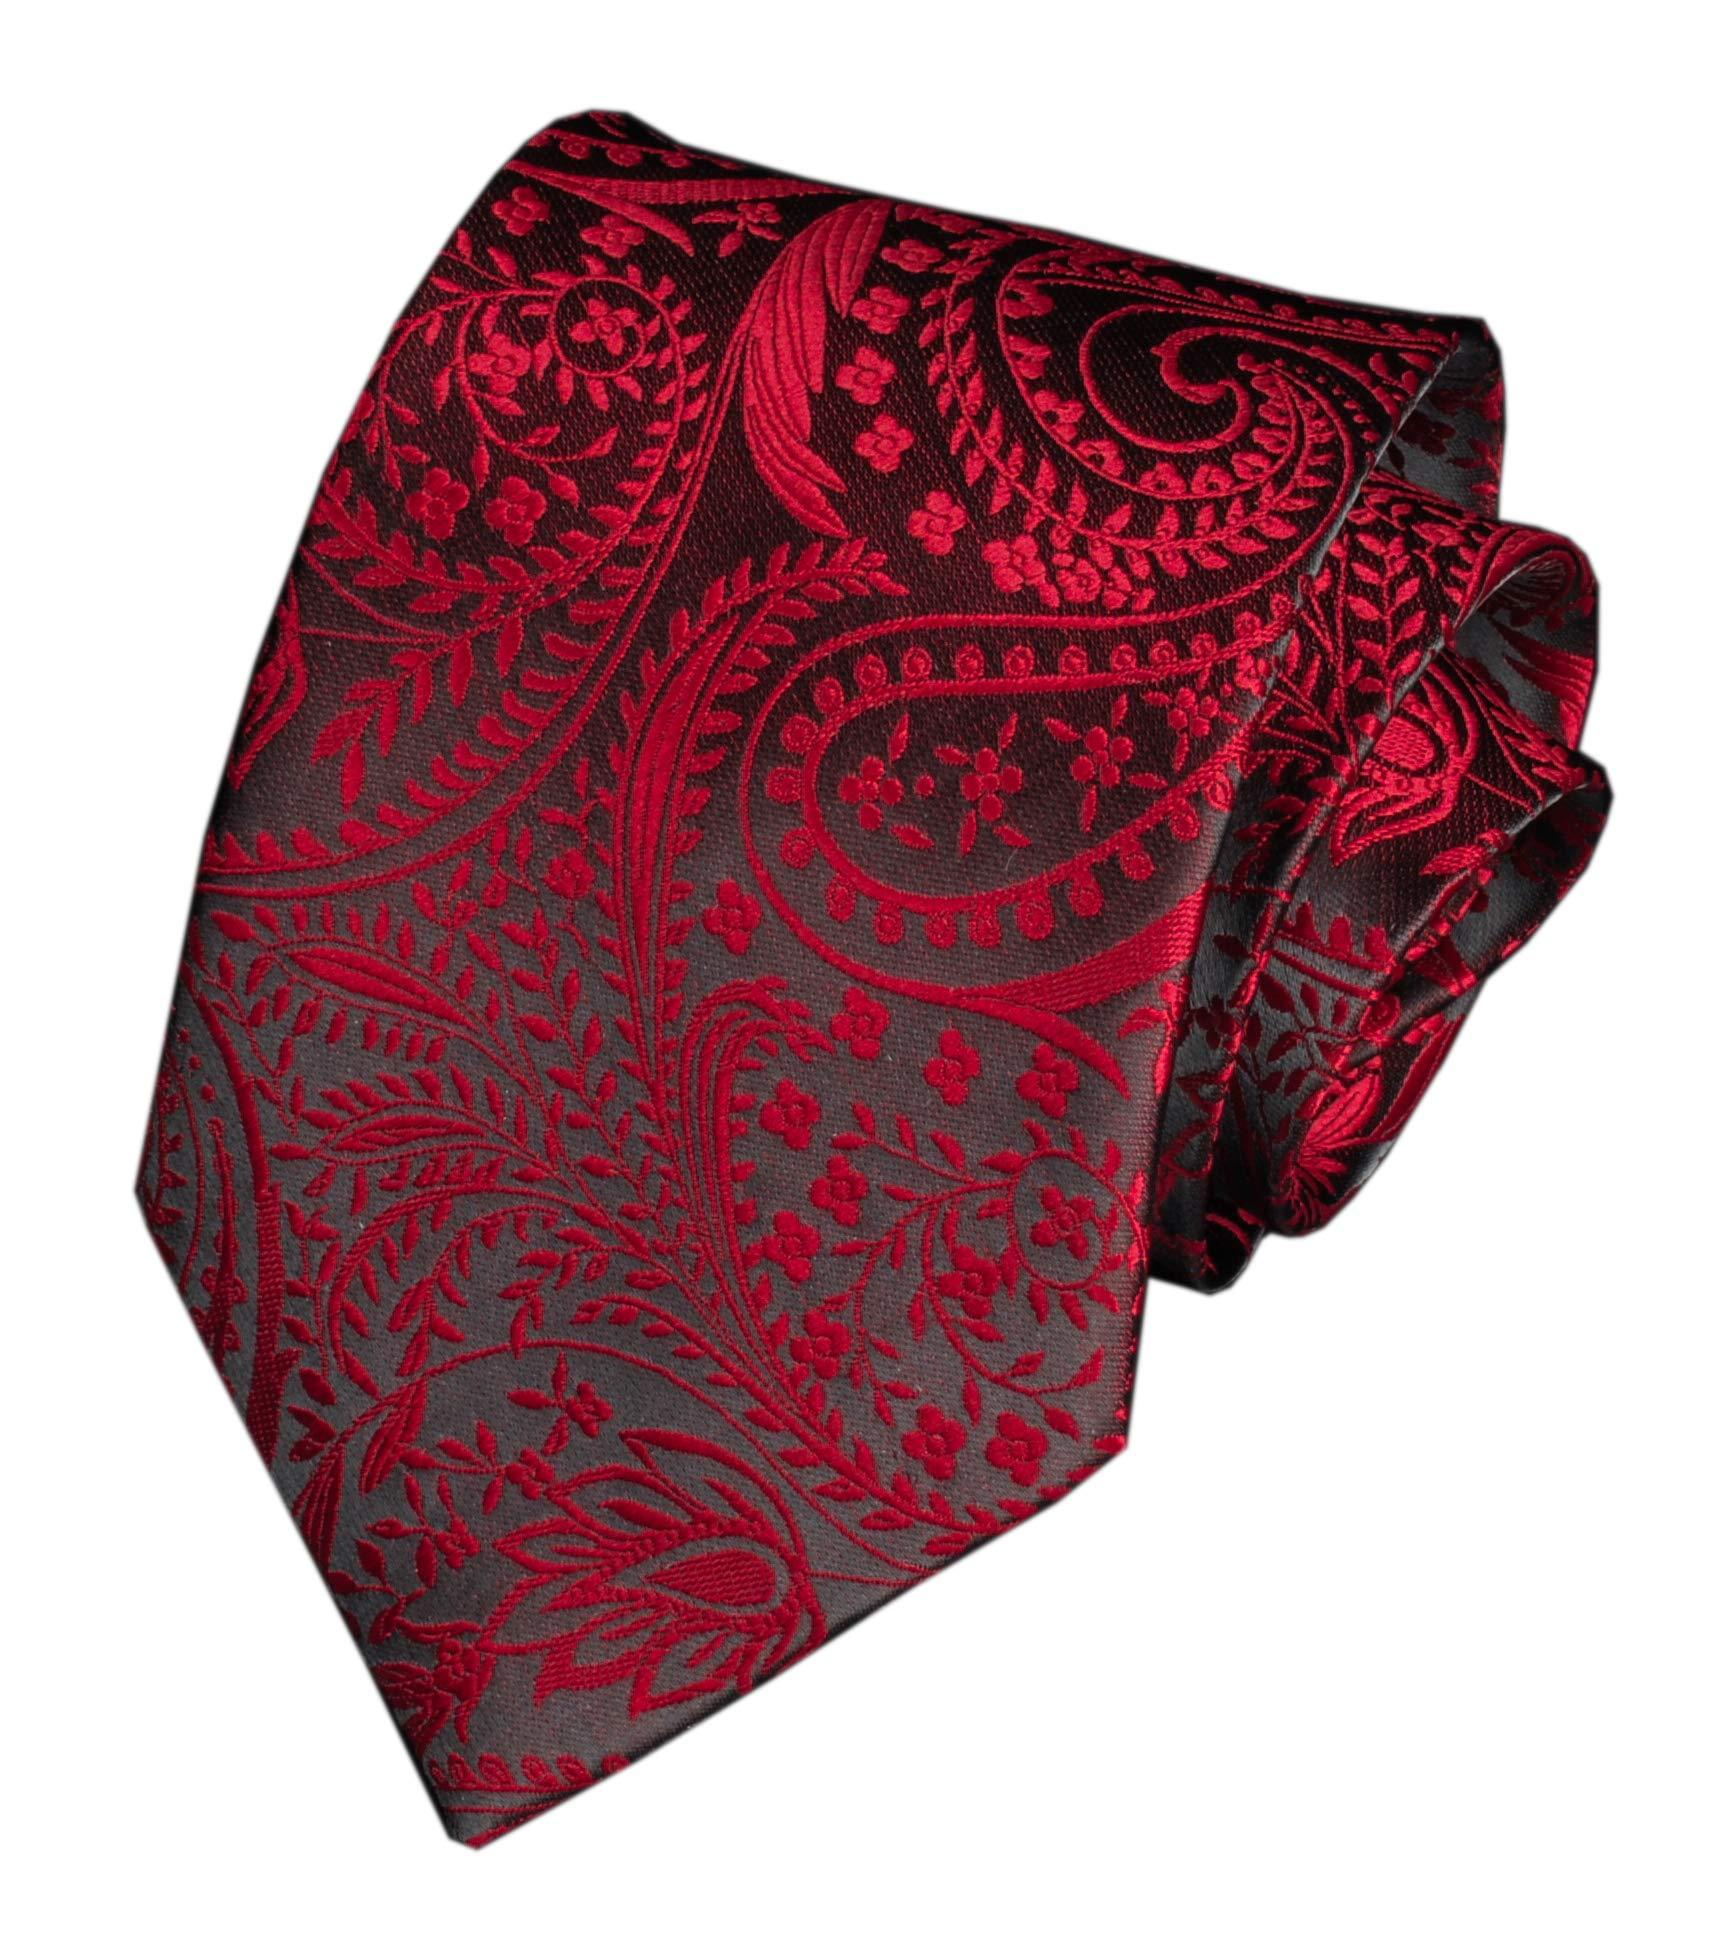 Mens Burgundy RED Black Slik Tie Adult Formal Sunny Self Modern Necktie Dad Gift